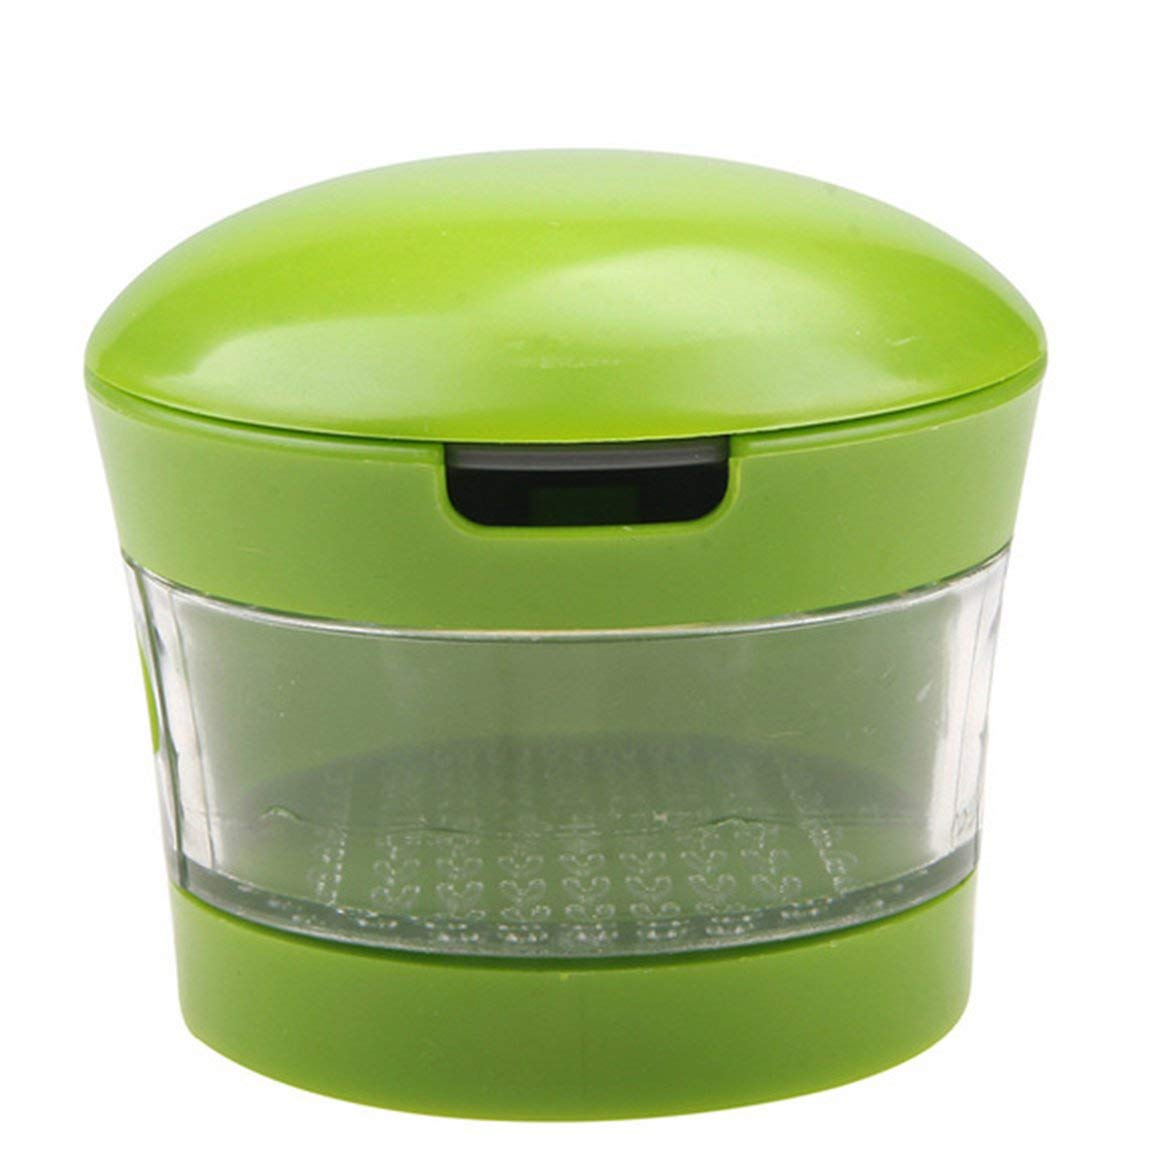 Kitchen Innovations Garlic Peel Garlic Press Crusher Mincer and Storage Container Garlic Chopper Kitchen Tool